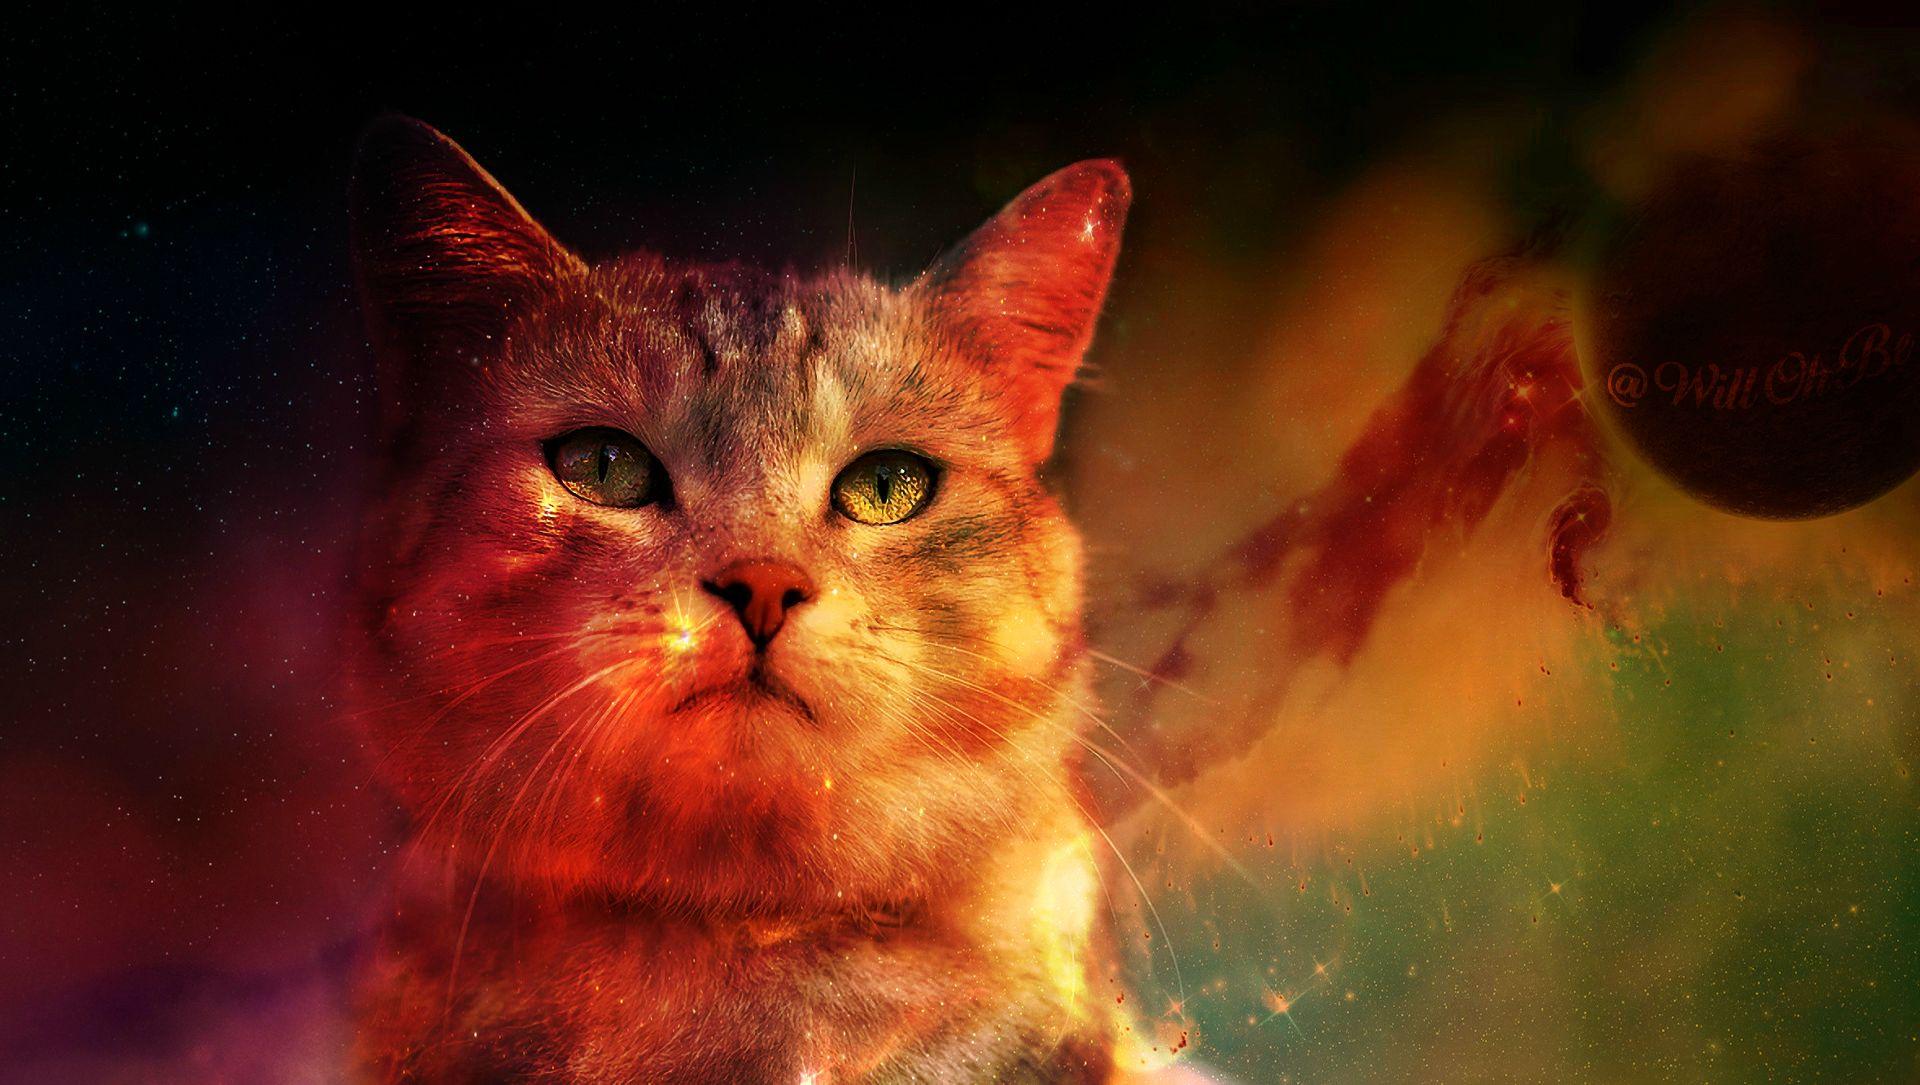 Cat Digital Art Space Planet Animals